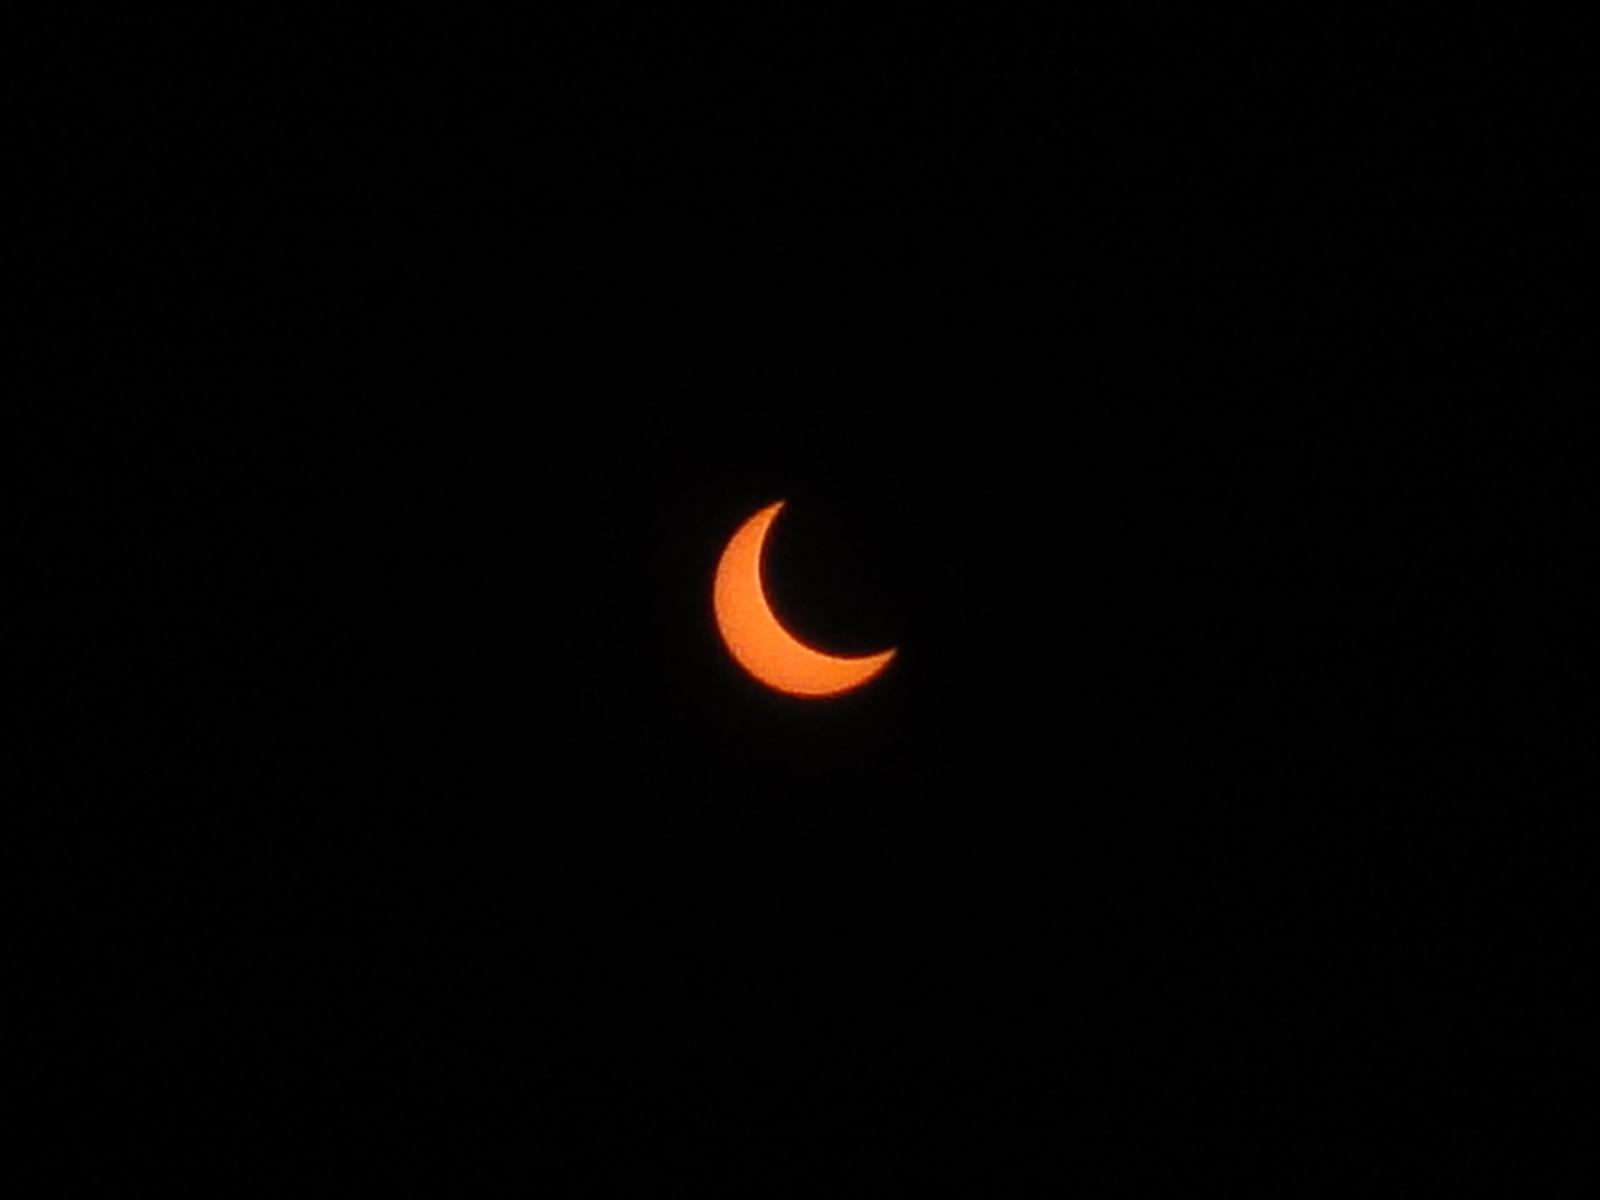 Solar_Eclipse_009.jpg